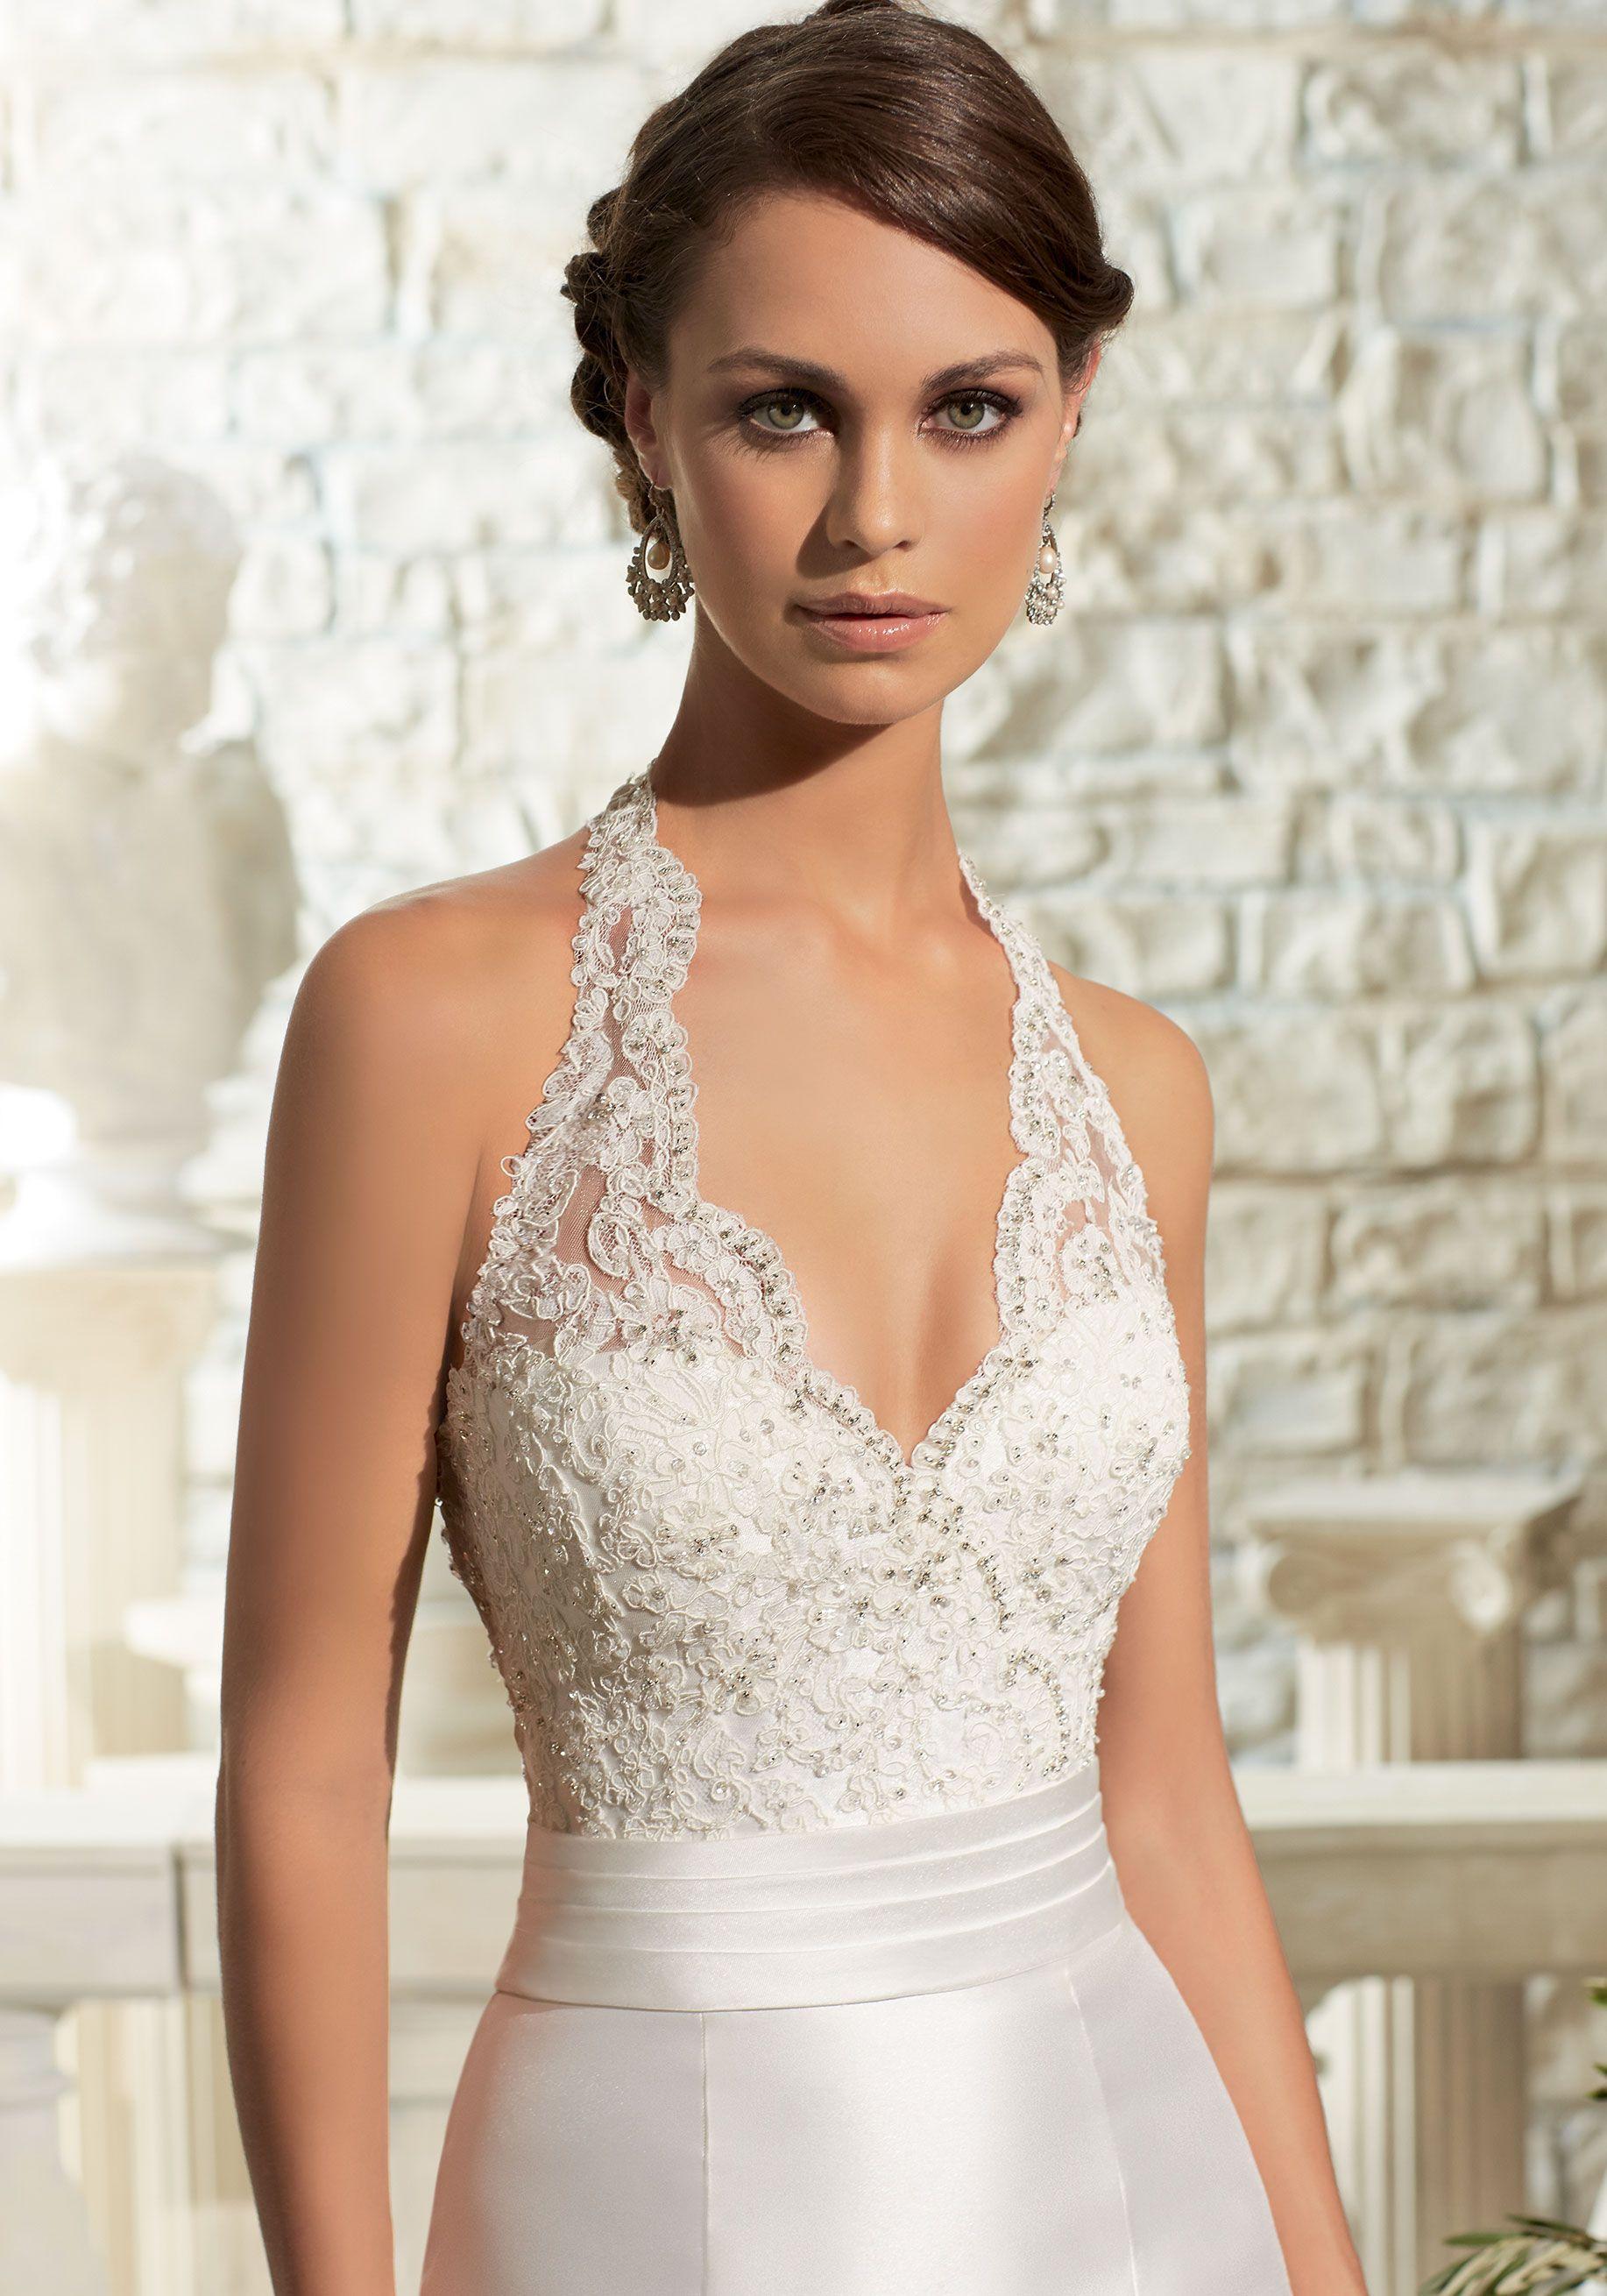 Satin With Crystal Beading On Lace Wedding Dress Morilee Halter Top Wedding Dress Wedding Dresses Satin Halter Wedding Dress [ 2620 x 1834 Pixel ]